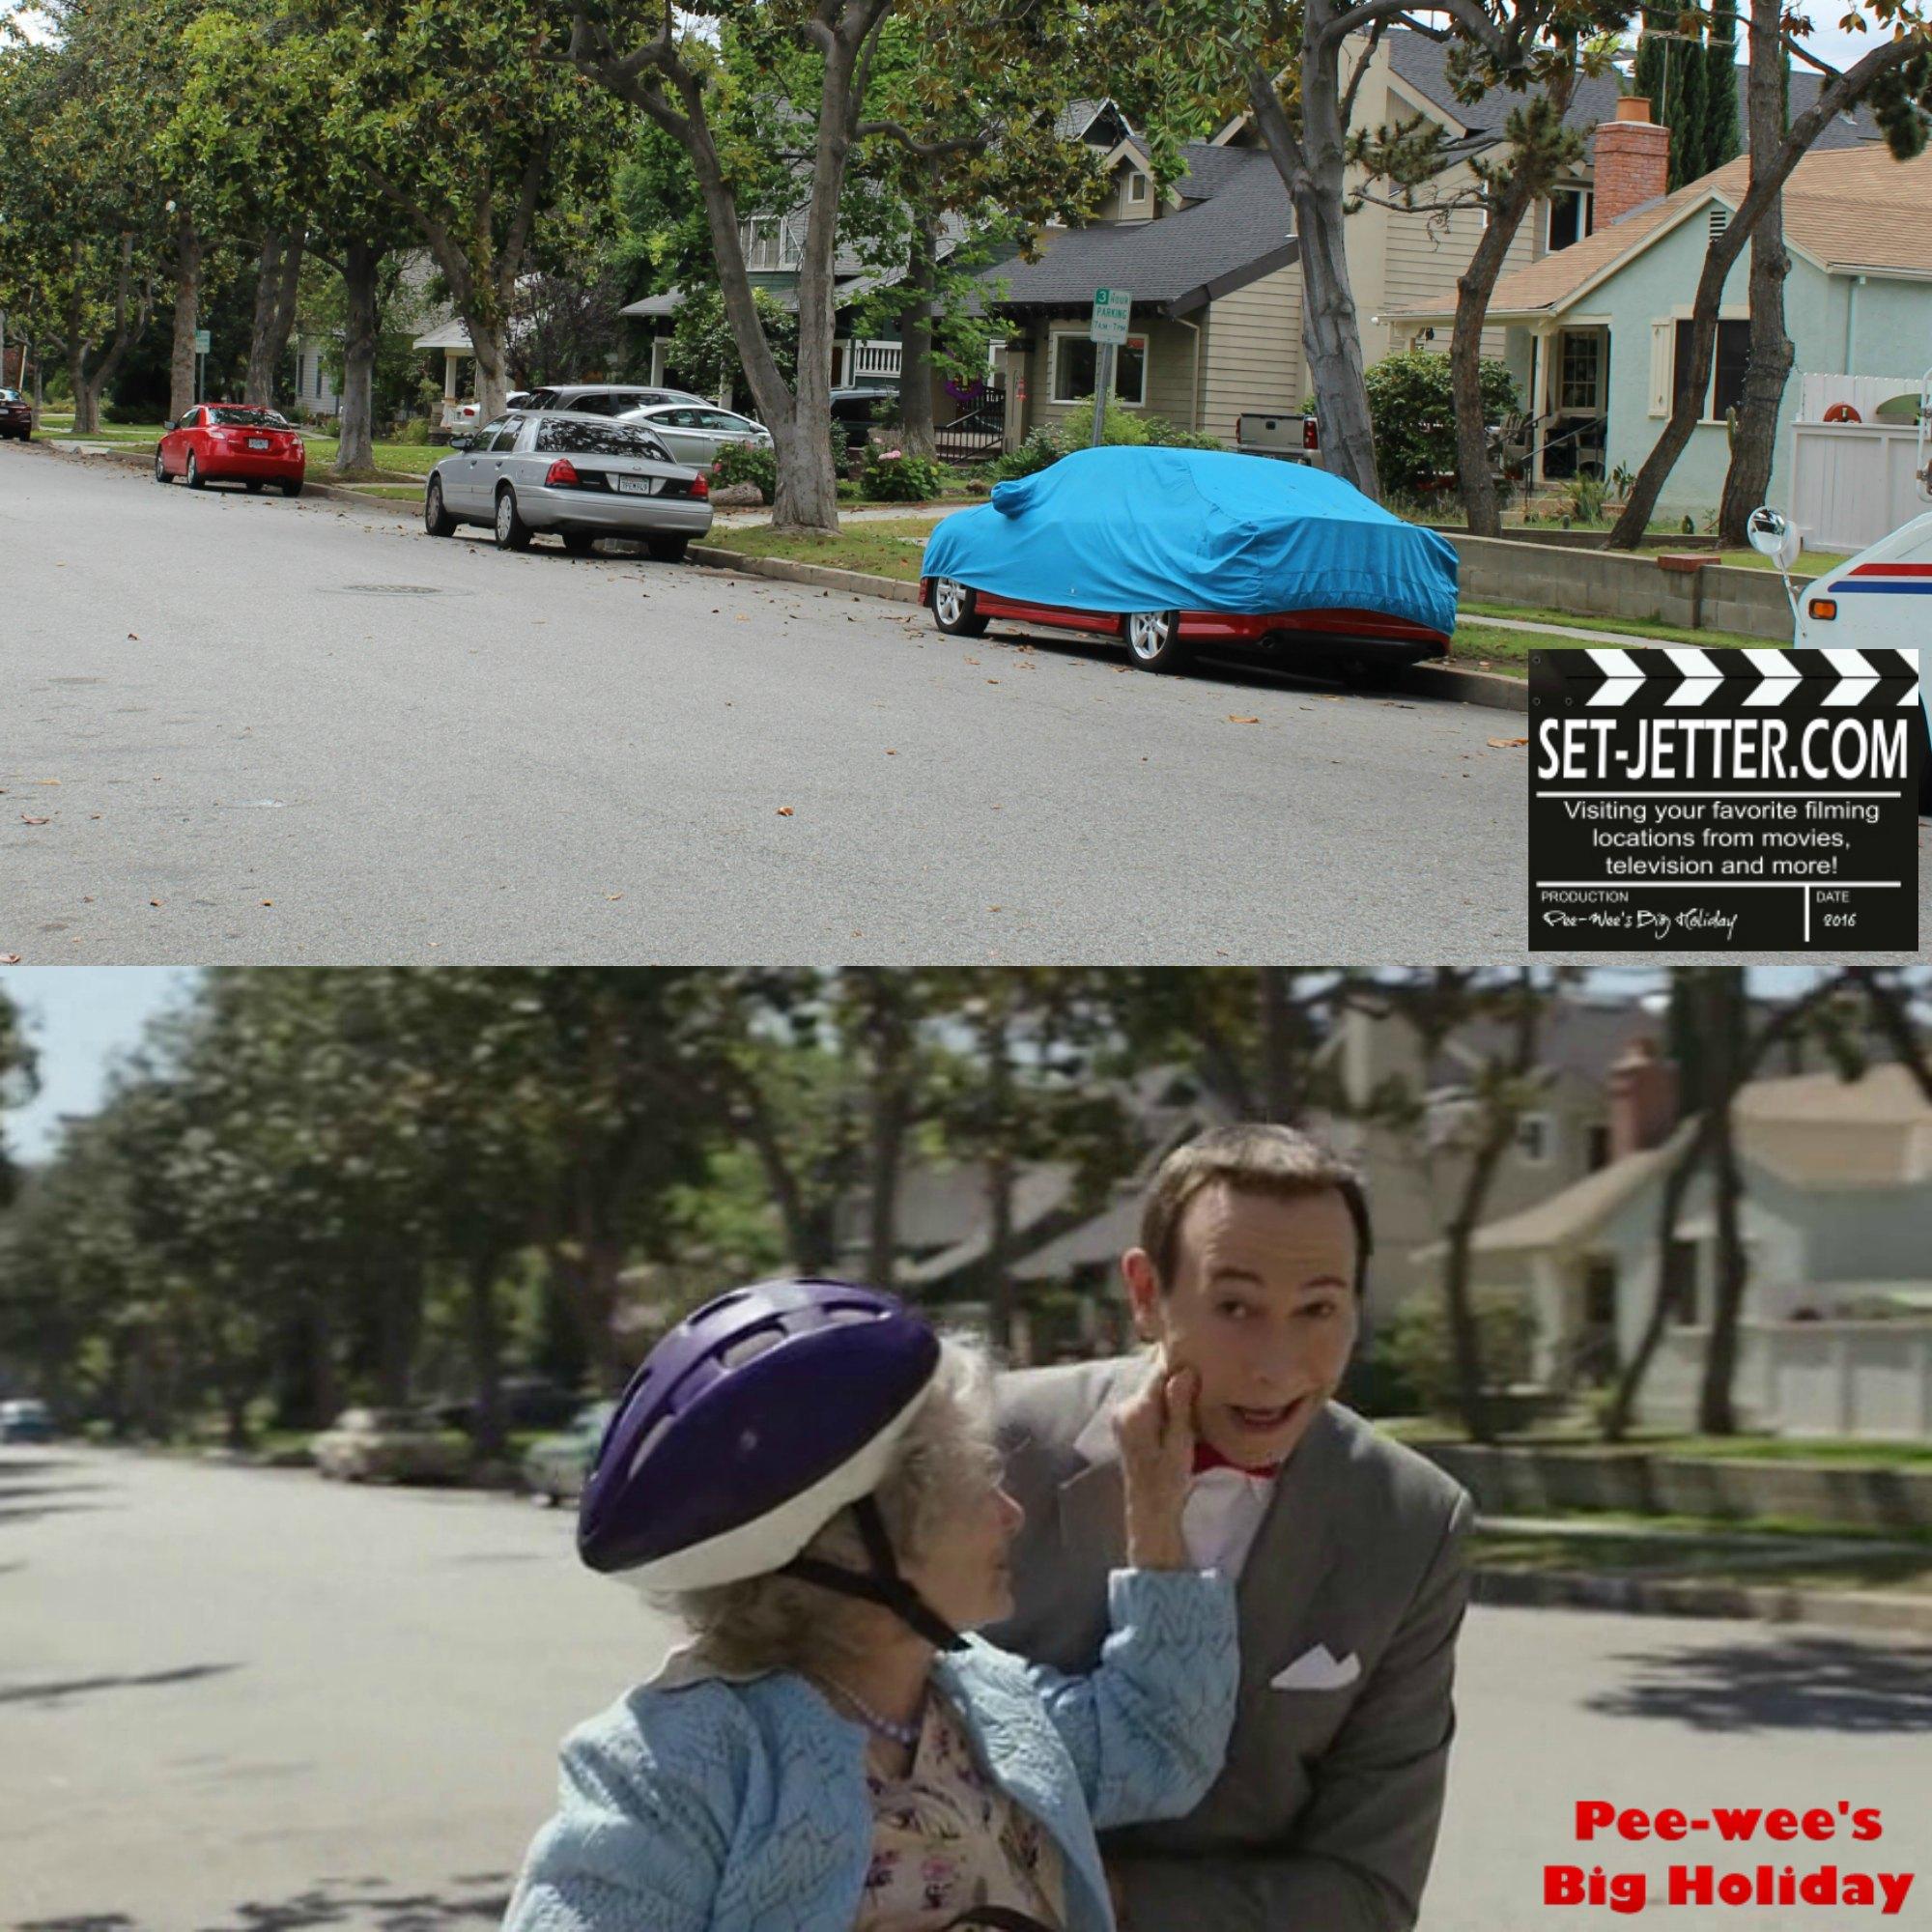 Pee Wee's Big Holiday comparison 229.jpg